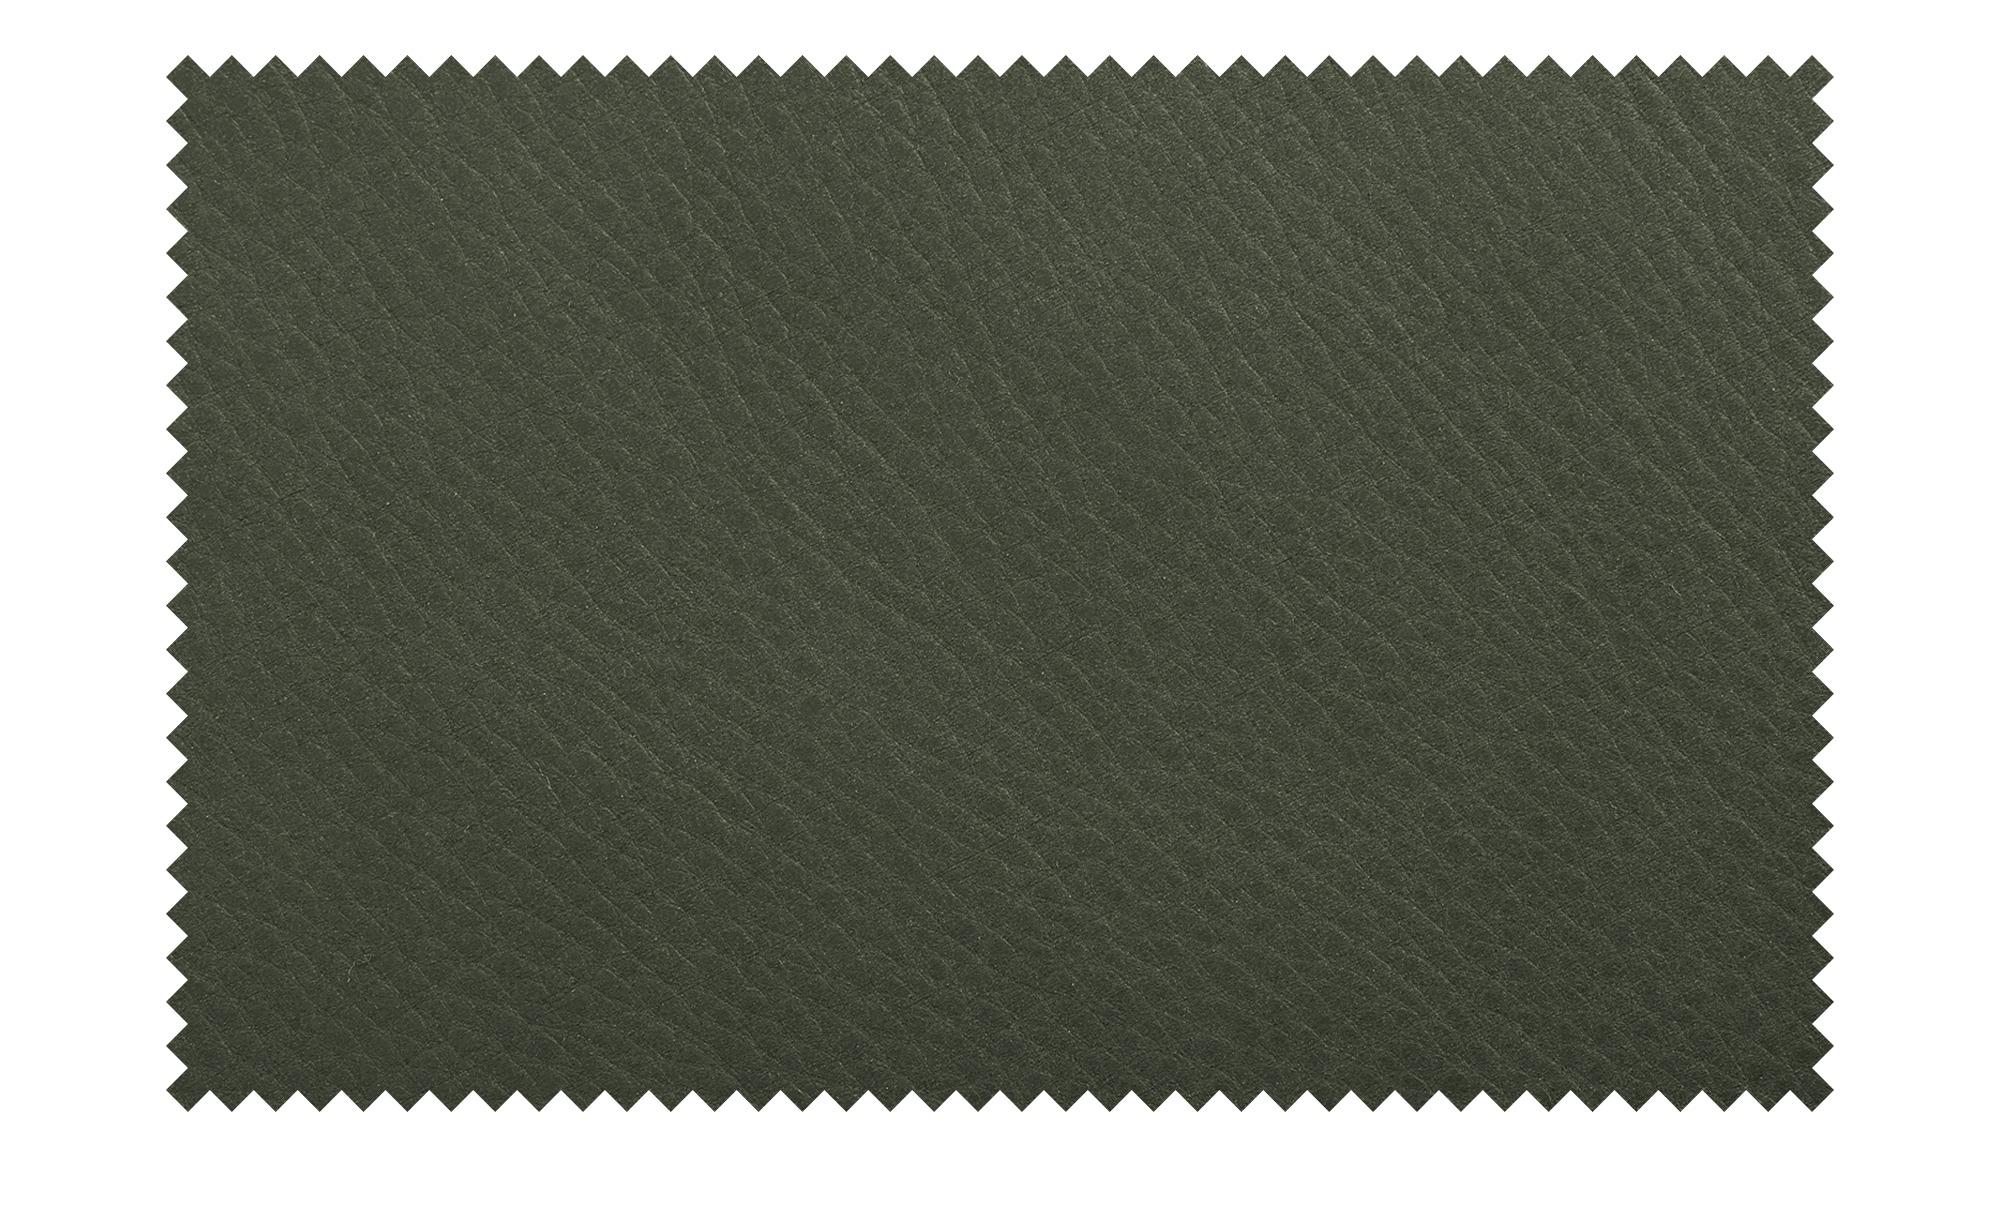 himolla Einzelsofa Leder  4818 ¦ grün ¦ Maße (cm): B: 217 H: 106 T: 92 Polstermöbel > Sofas > 3-Sitzer - Höffner